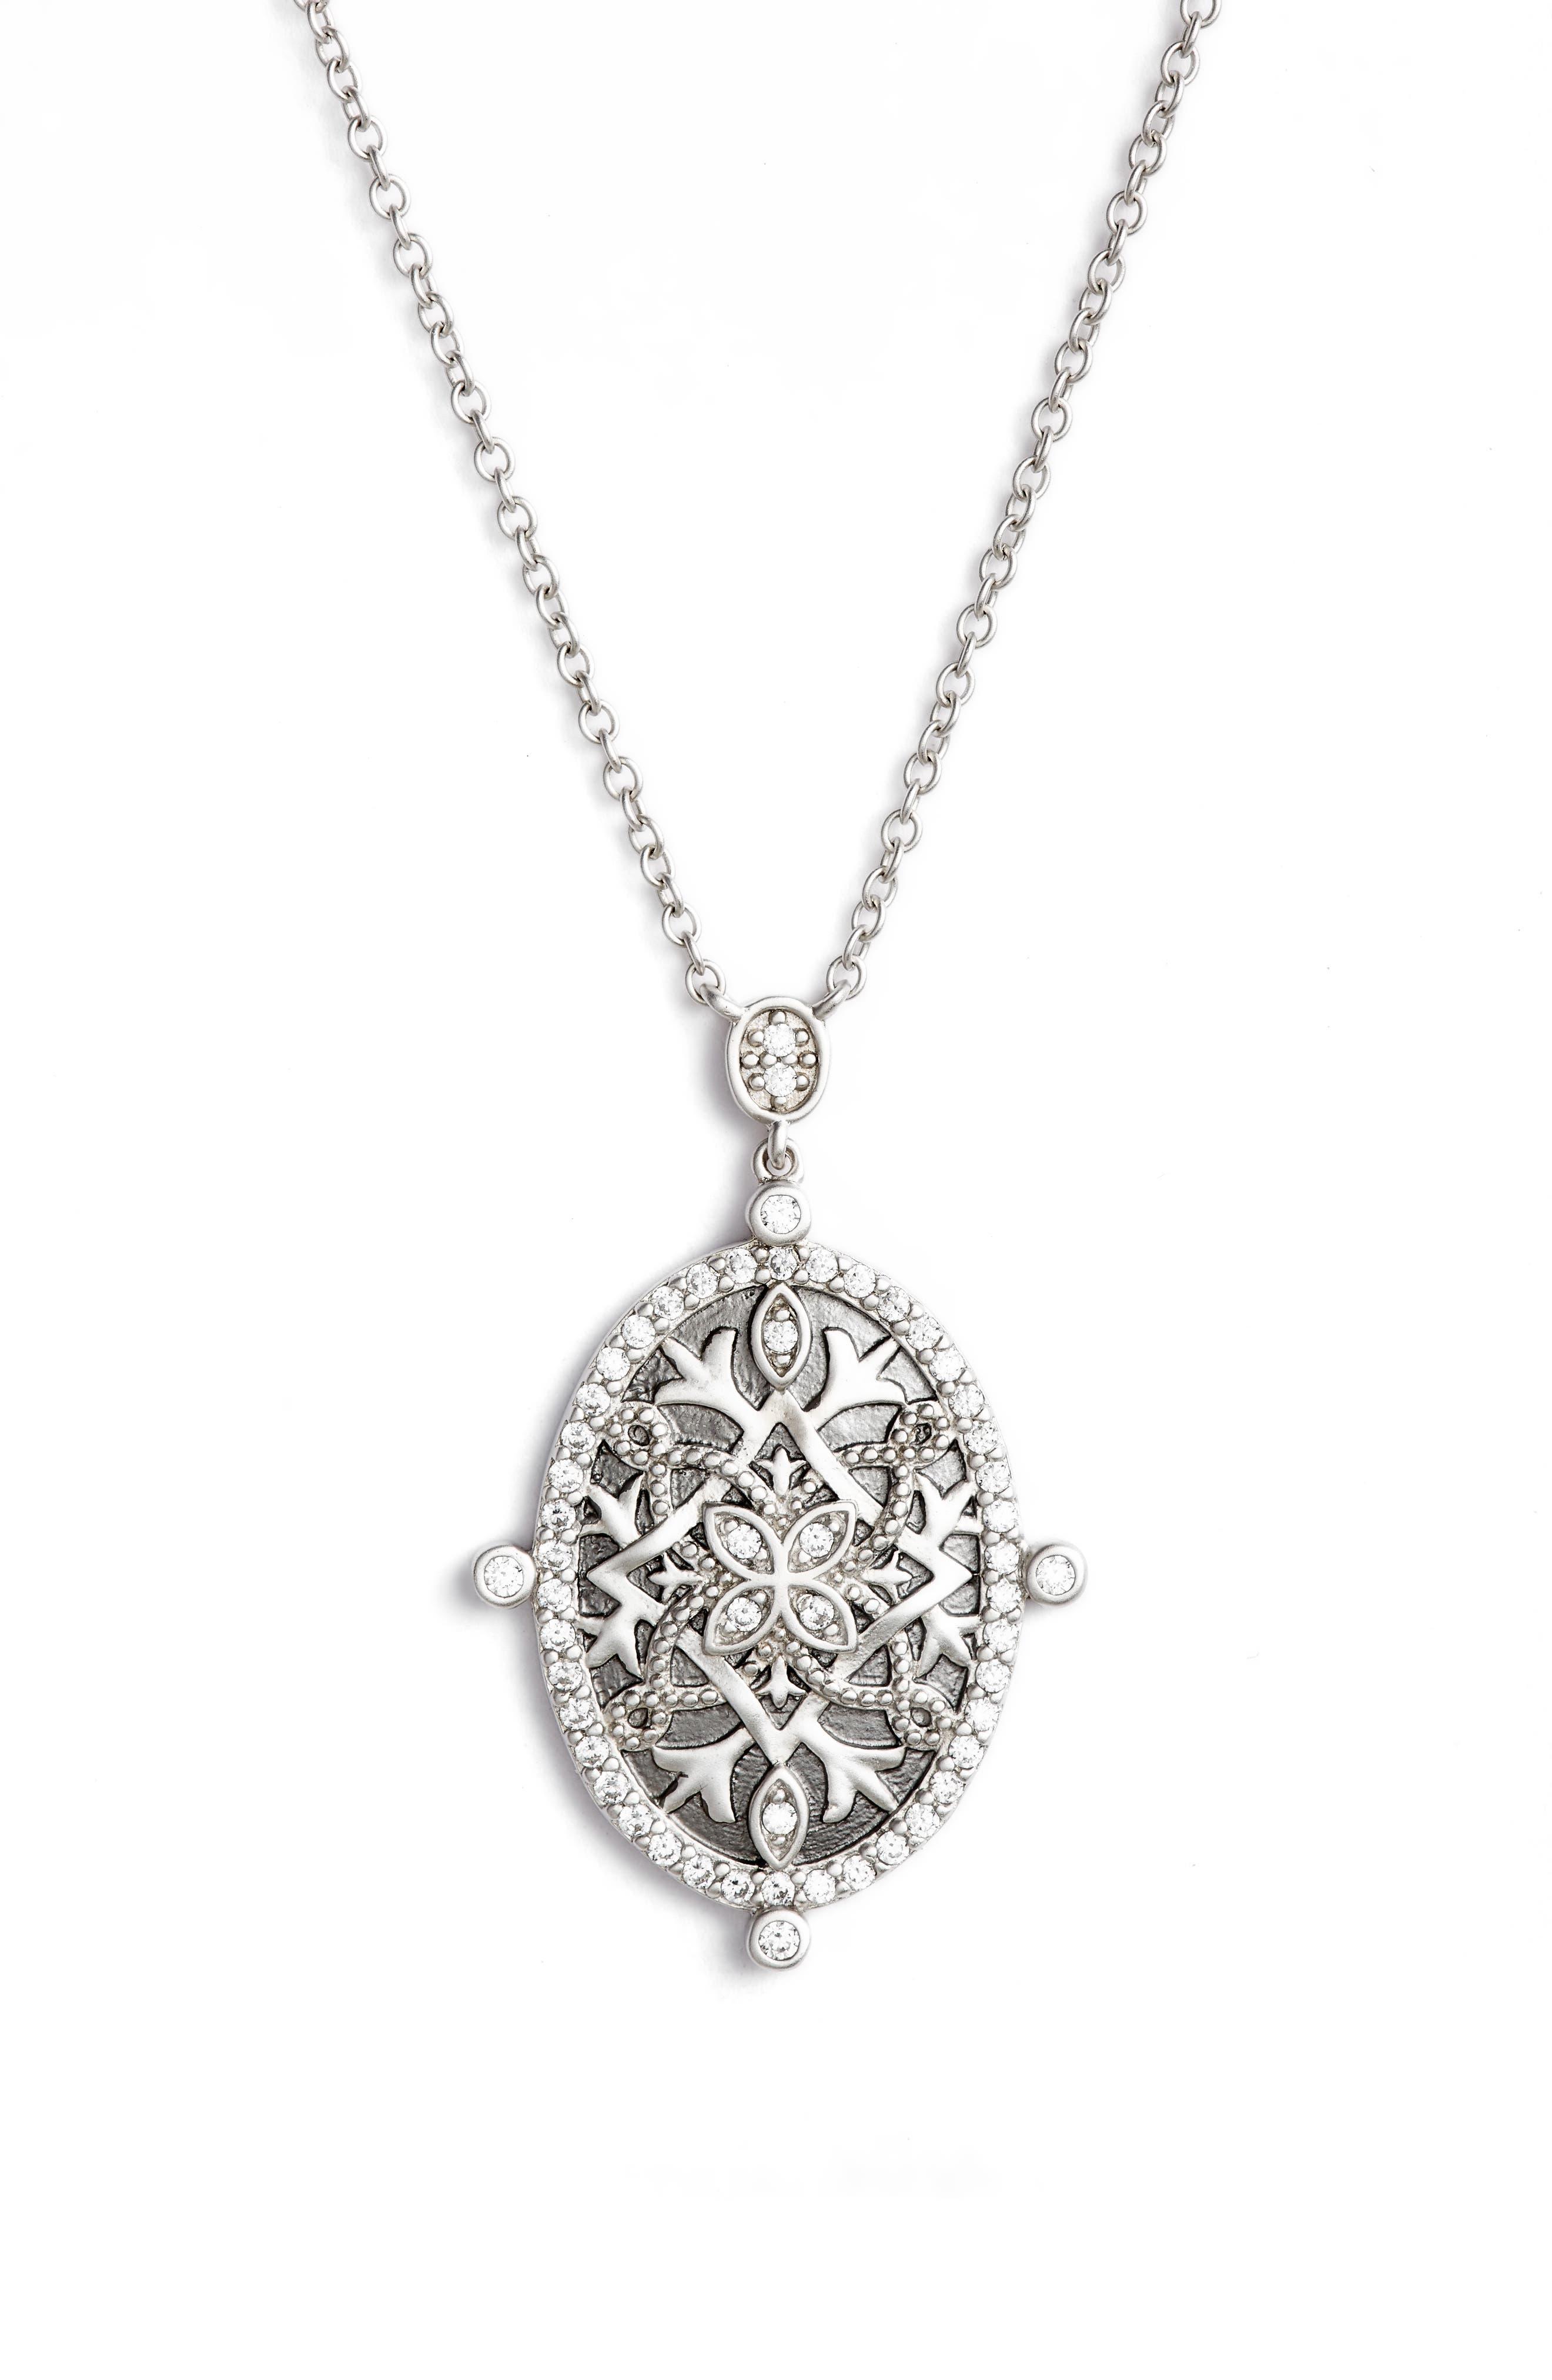 Contemporary Deco Celestial Pendant Necklace,                             Main thumbnail 1, color,                             040